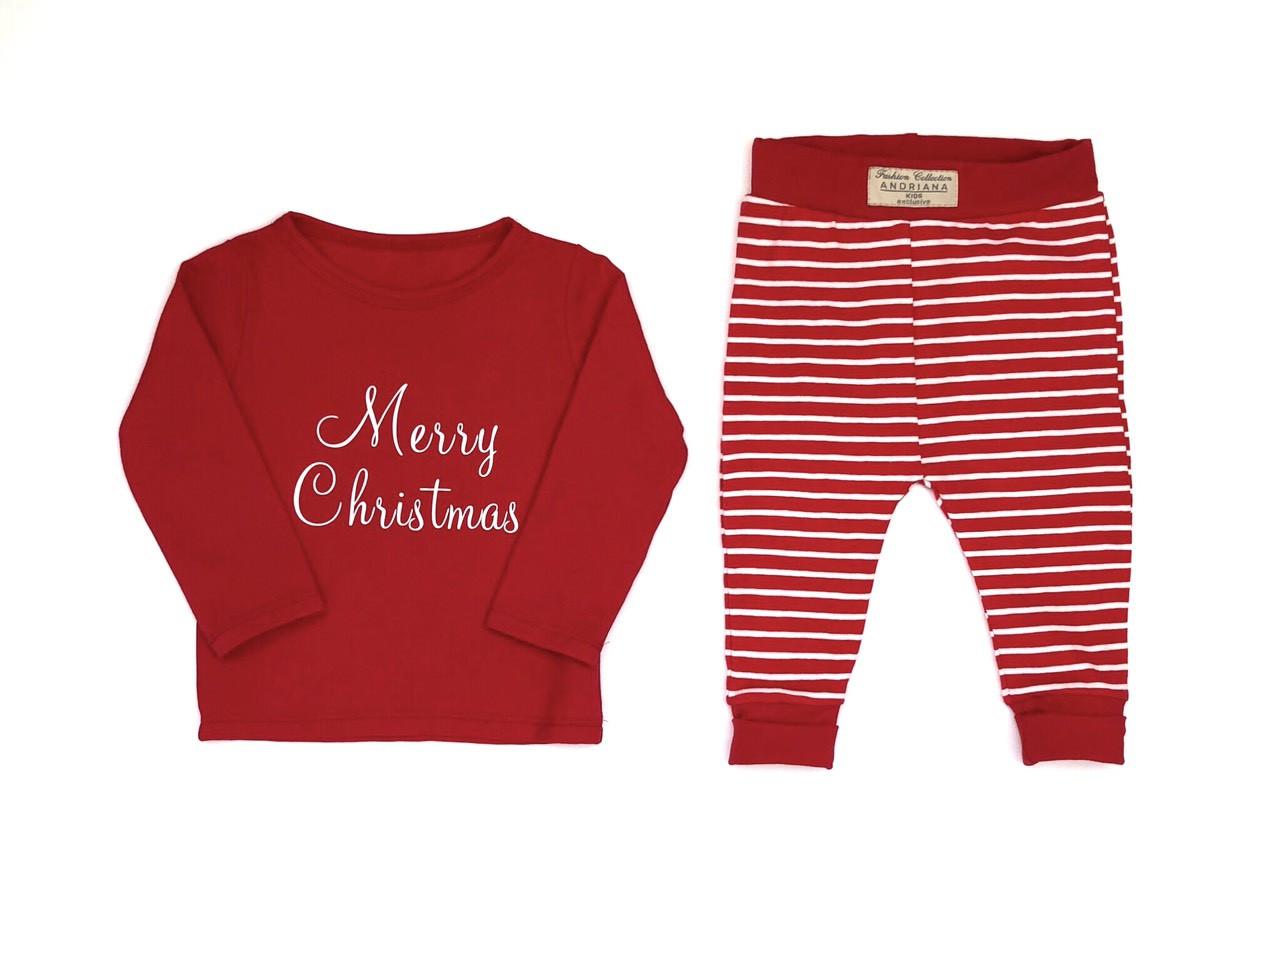 Комплект Merry Christmas Andriana Kids от 0 до 4 лет